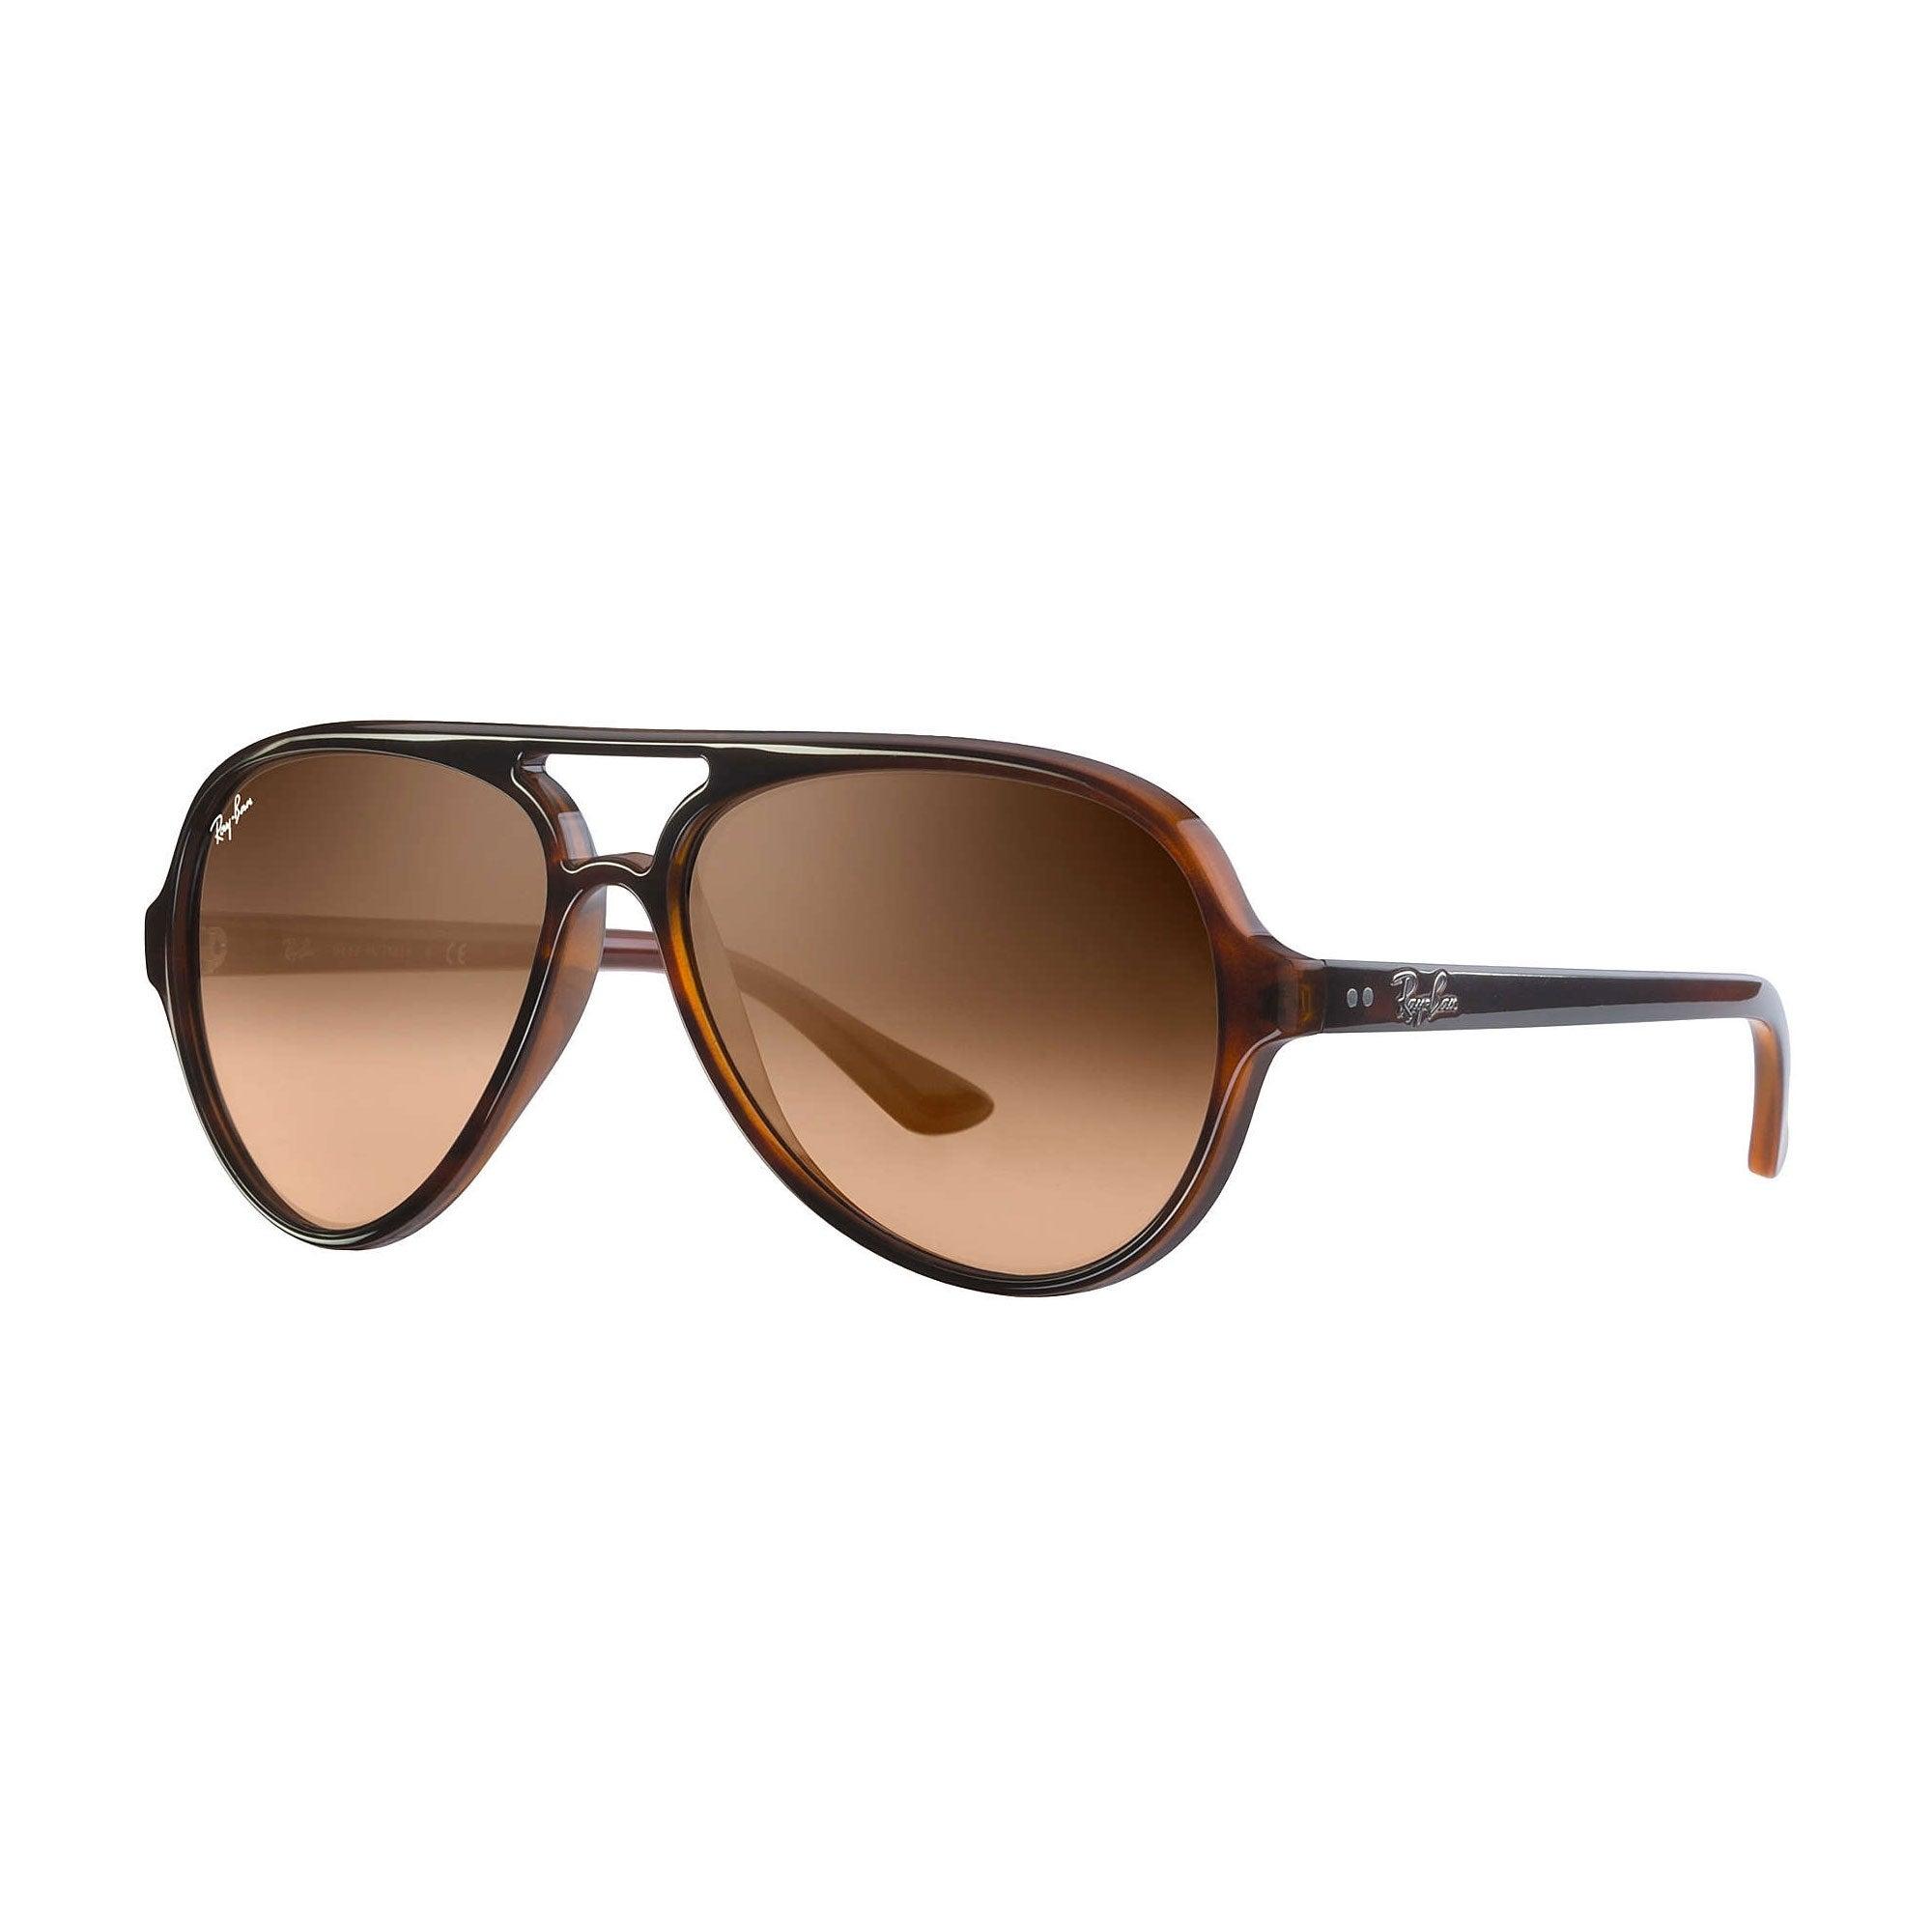 ray ban solbriller amazon aviator